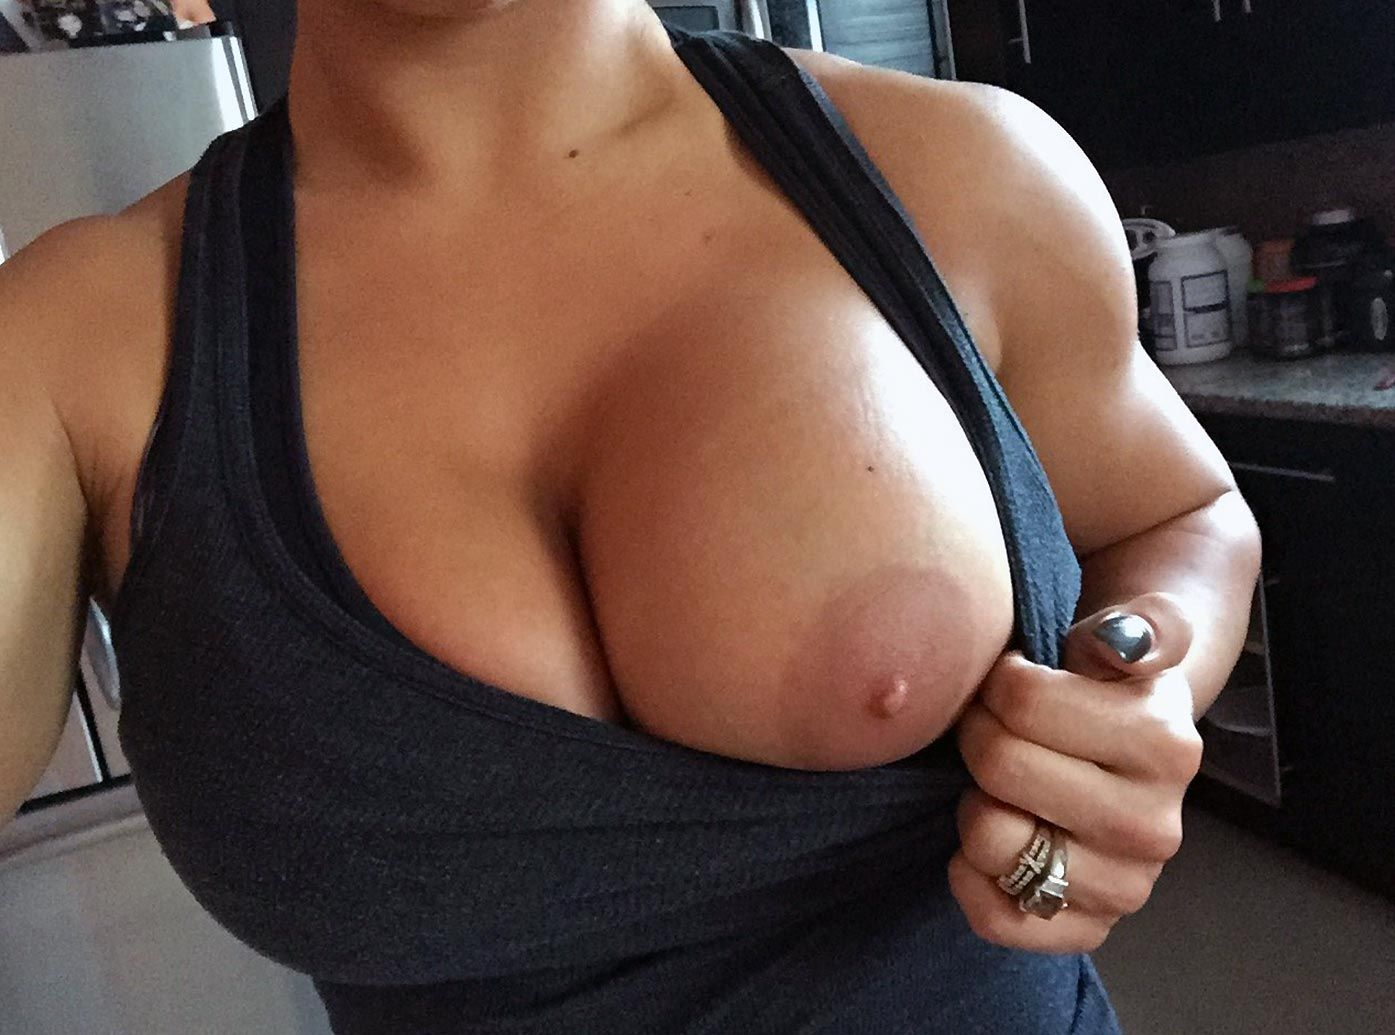 Celeste Bonin Nude Leaked The Fappening & Sexy 0237